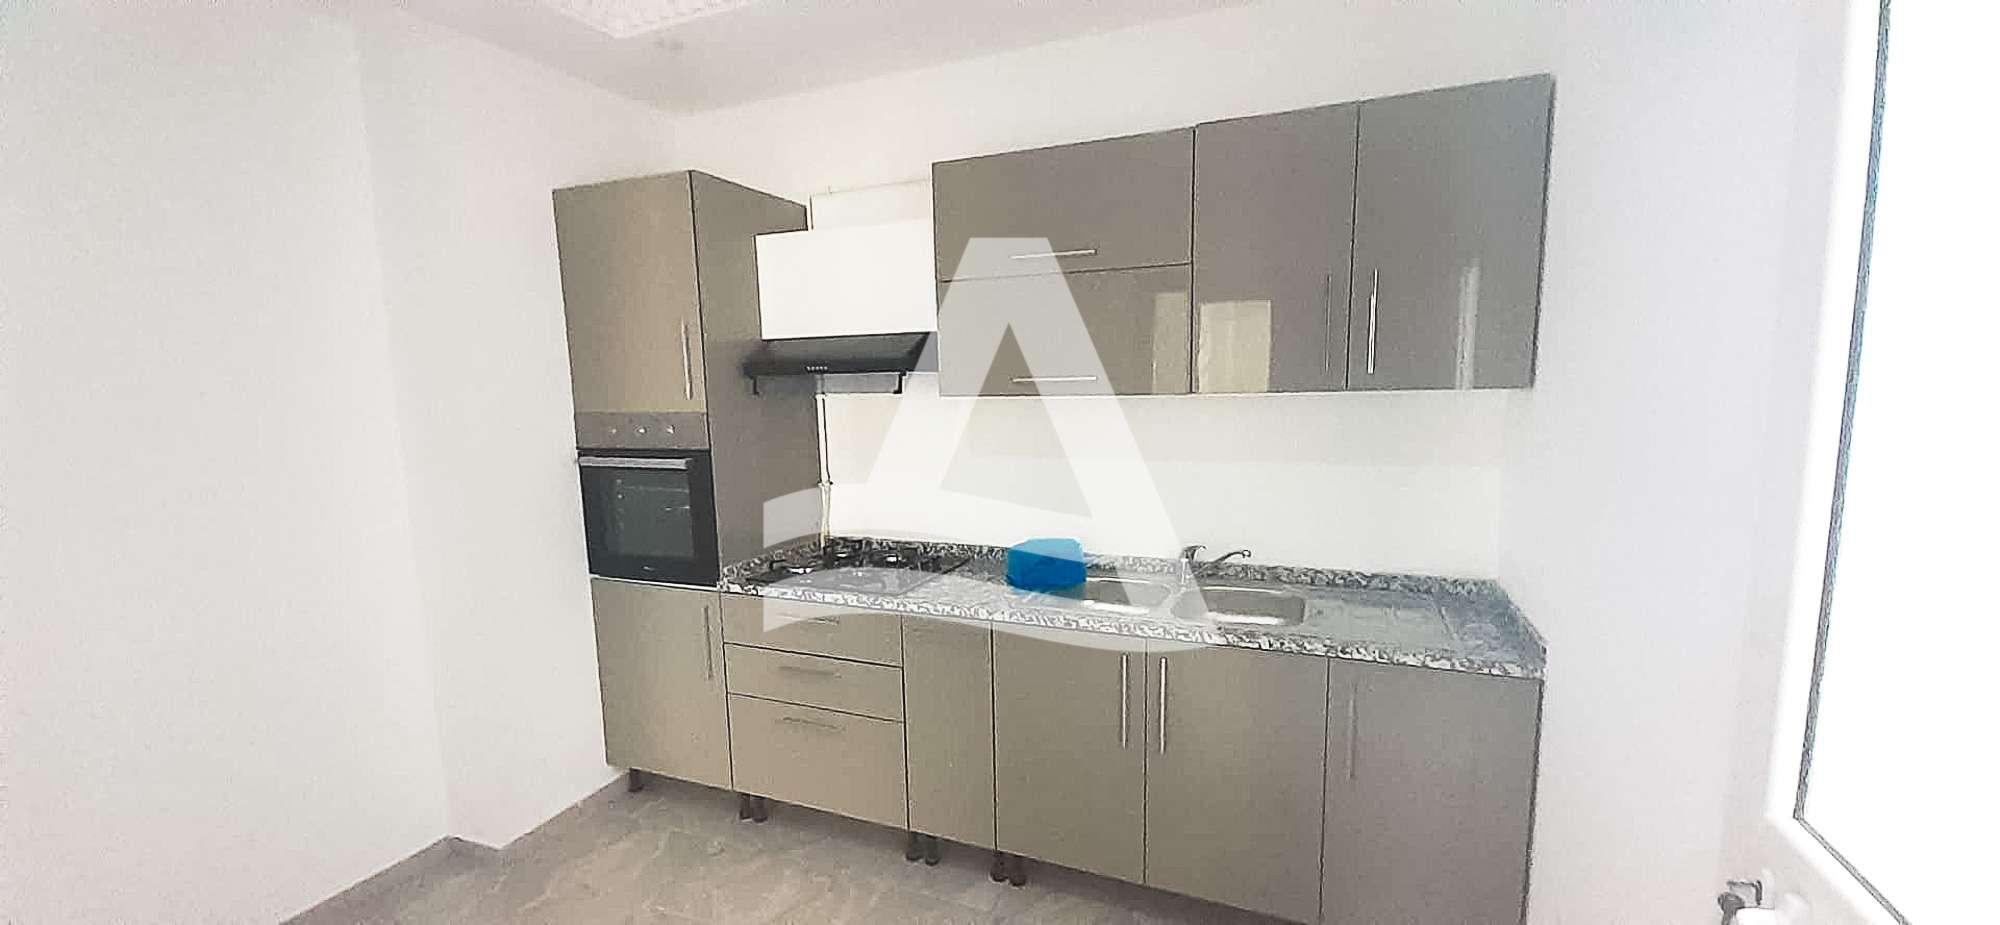 httpss3.amazonaws.comlogimoaws_Arcane_immobilière_la_Marsa-_location_-_vente_la_marsa_8_sur_9_1574175648032